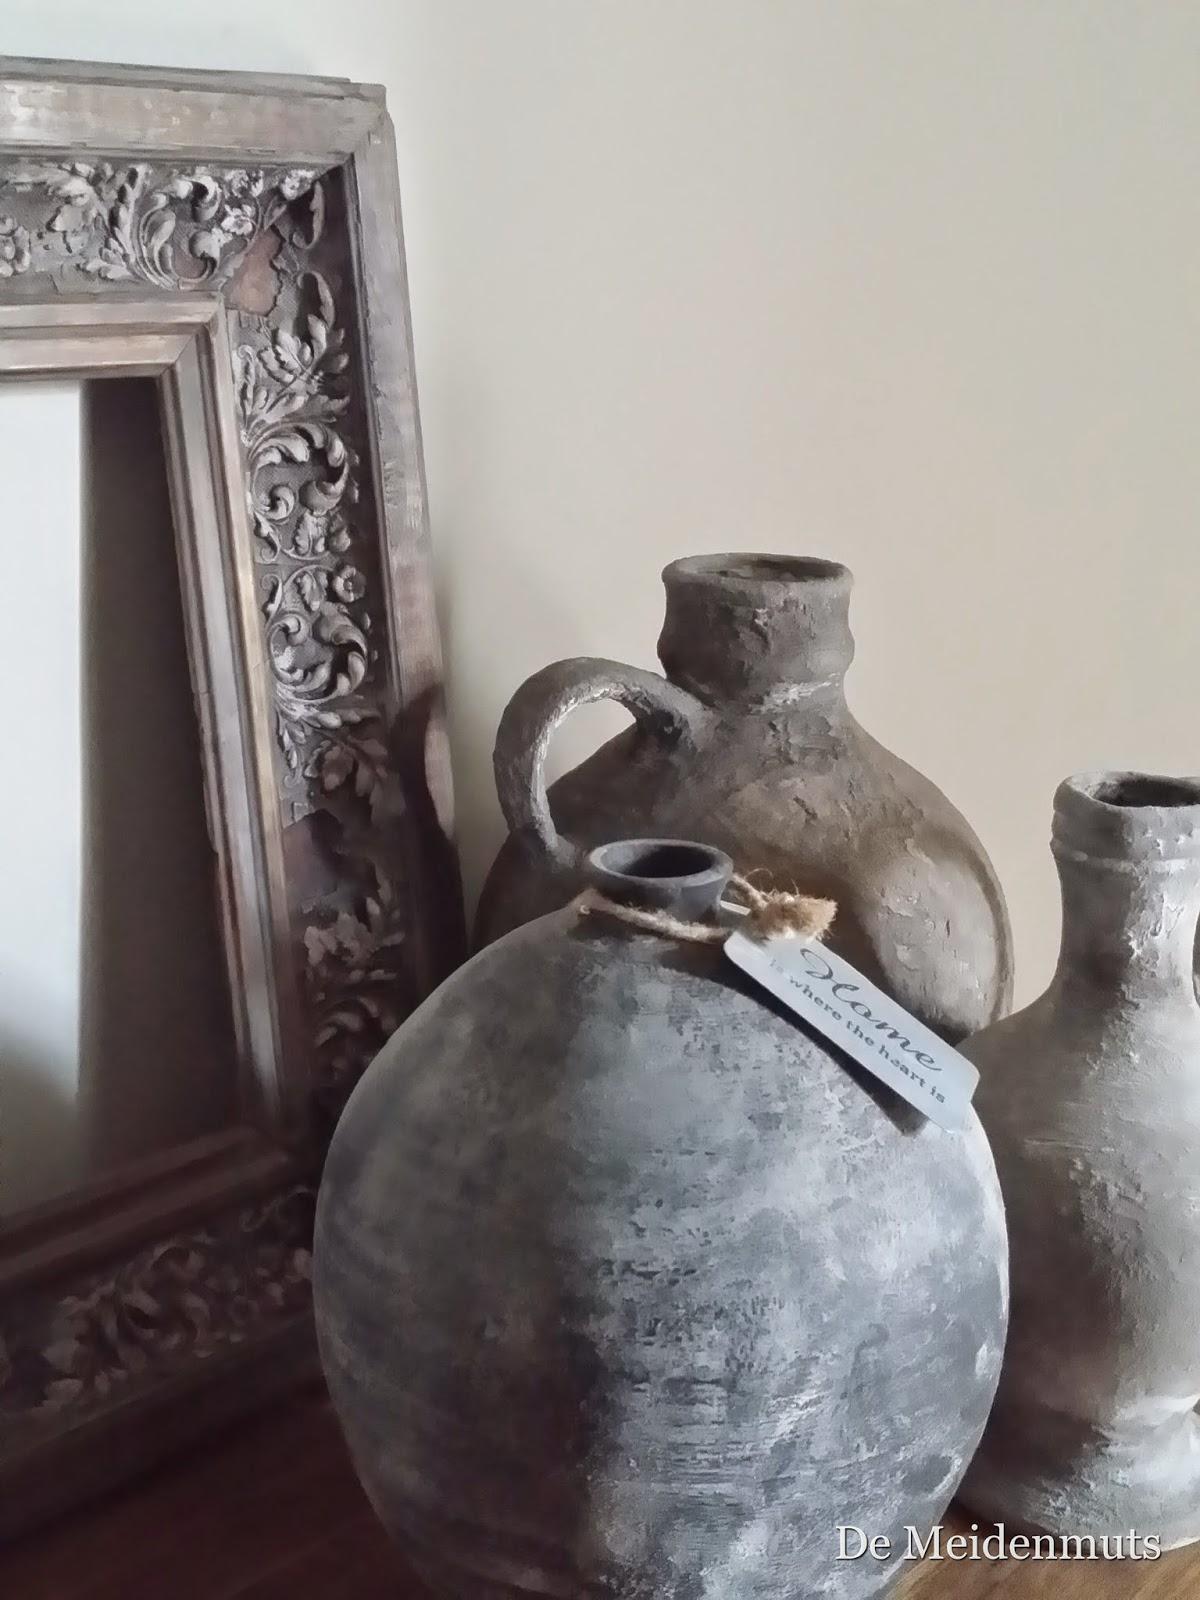 De meidenmuts oktober 2014 for Deco oude huis